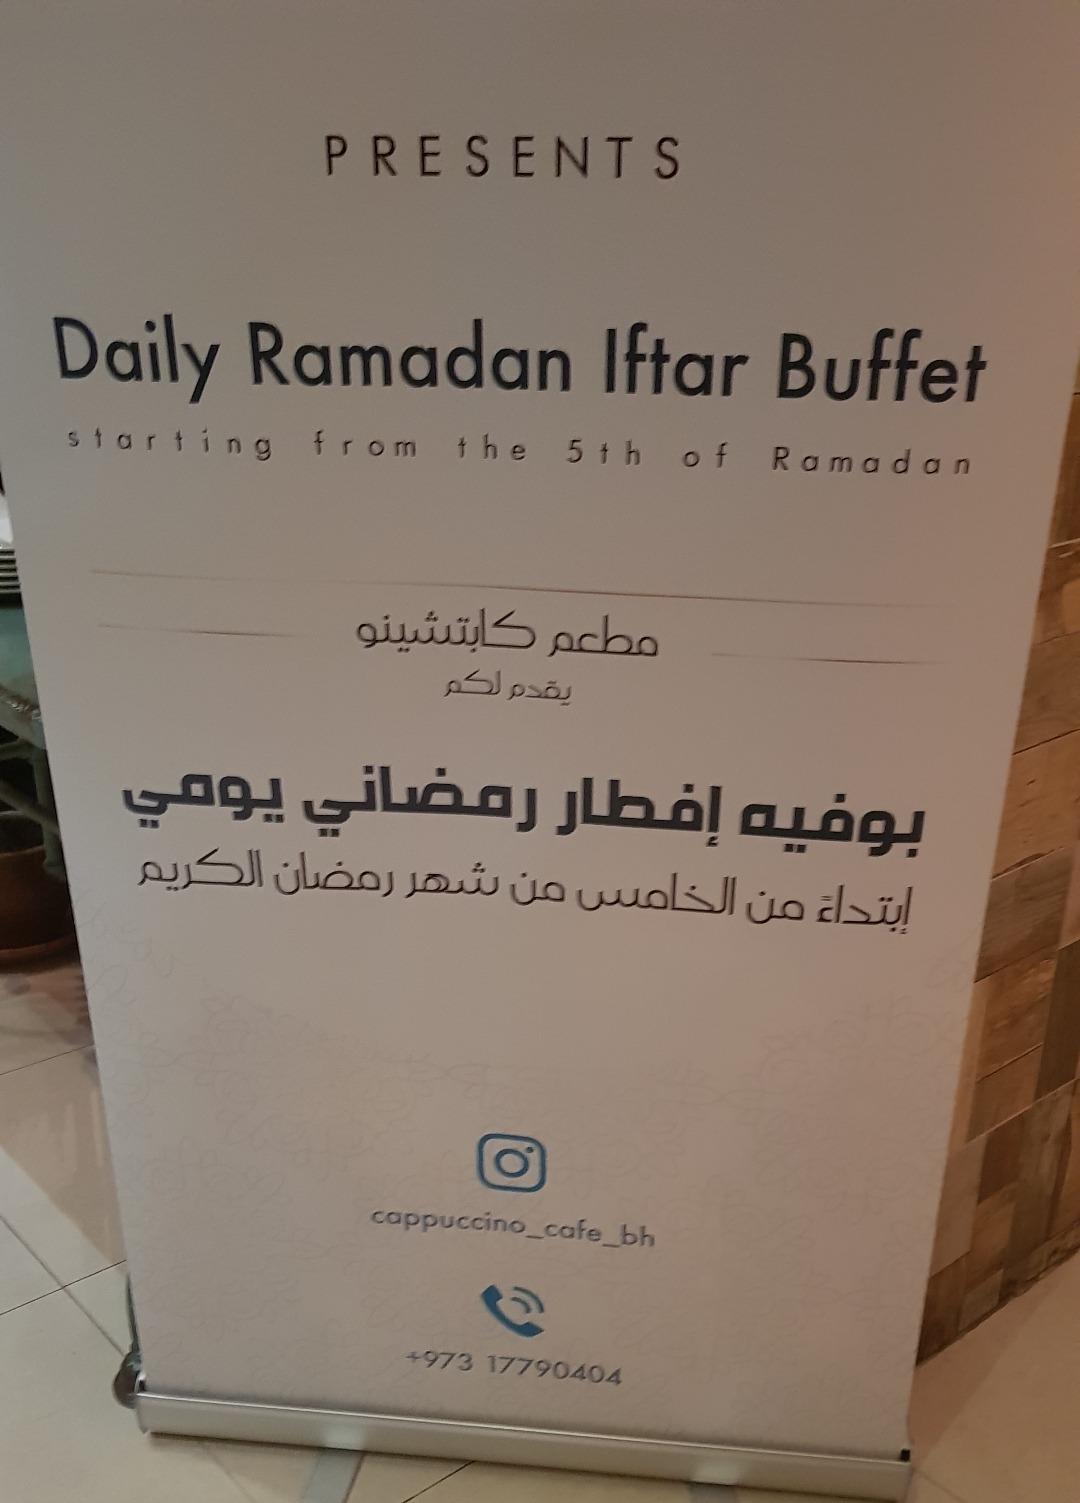 ramadhan Iftar  buffet @ Cappuccino Cafe - Bahrain